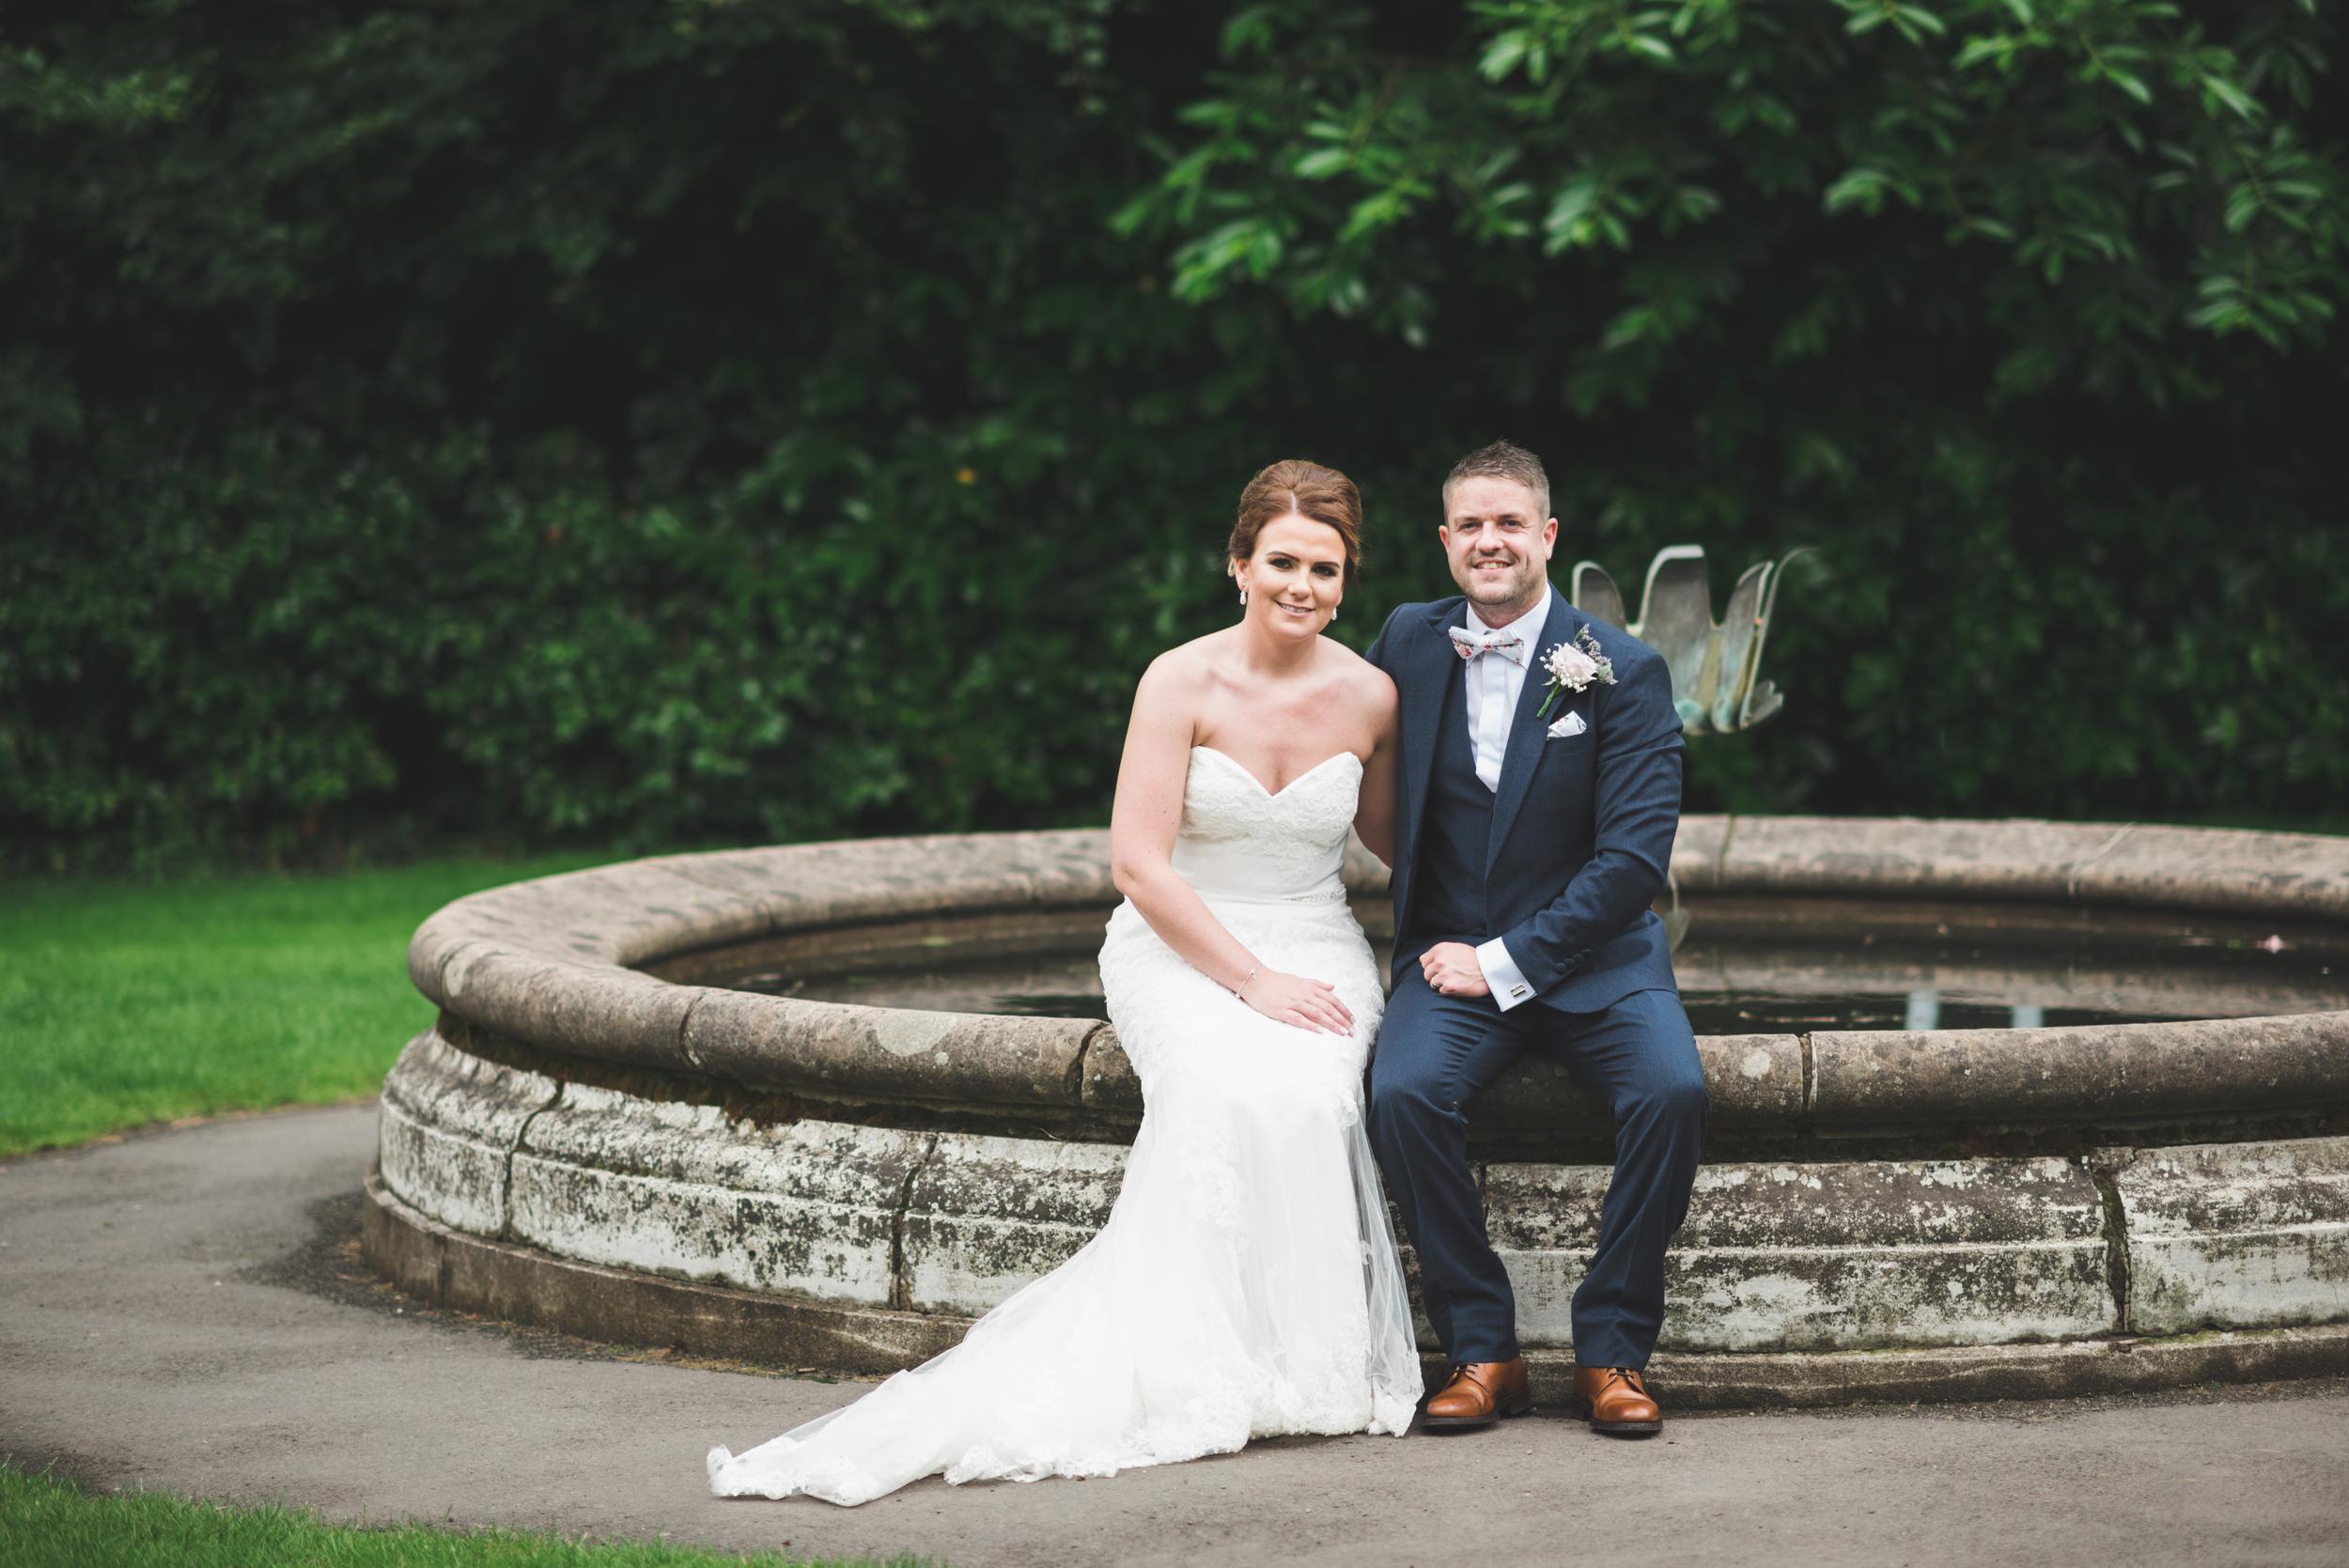 Northern Ireland Wedding Photographer purephotoni Sir Thomas and lady dixons park bride groom fountain